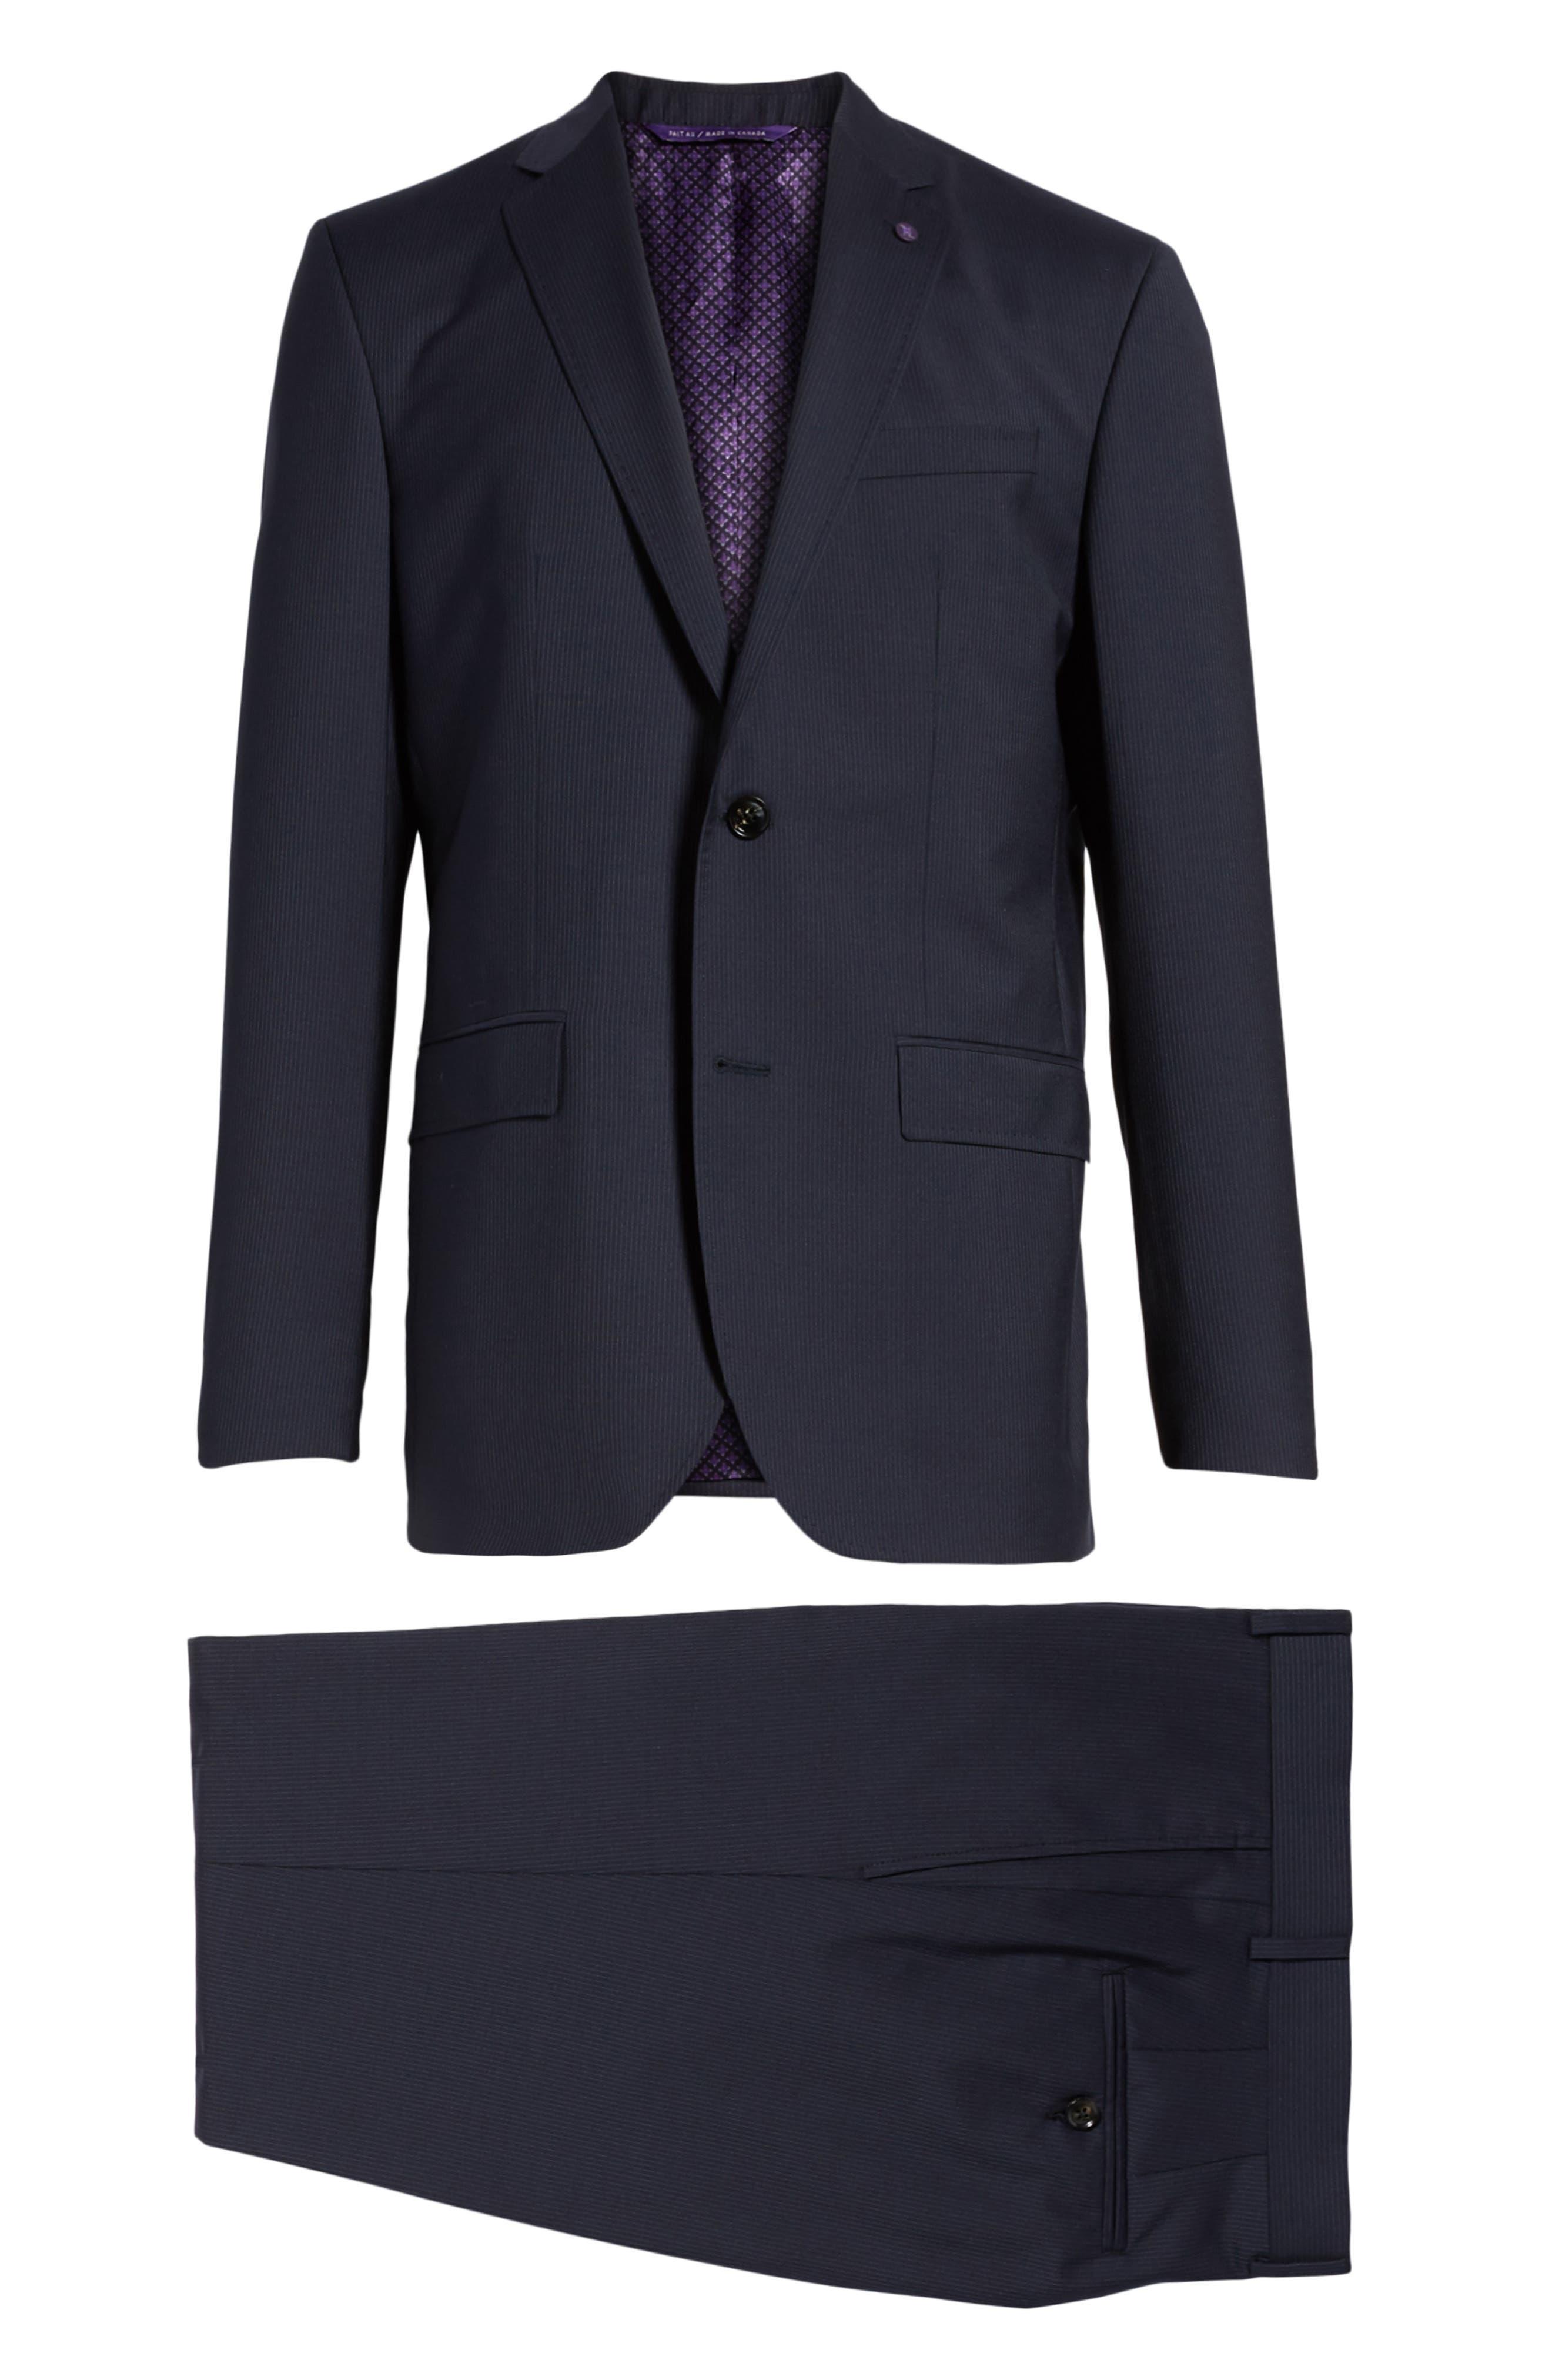 Jay Trim Fit Stripe Wool Suit,                             Alternate thumbnail 9, color,                             NAVY